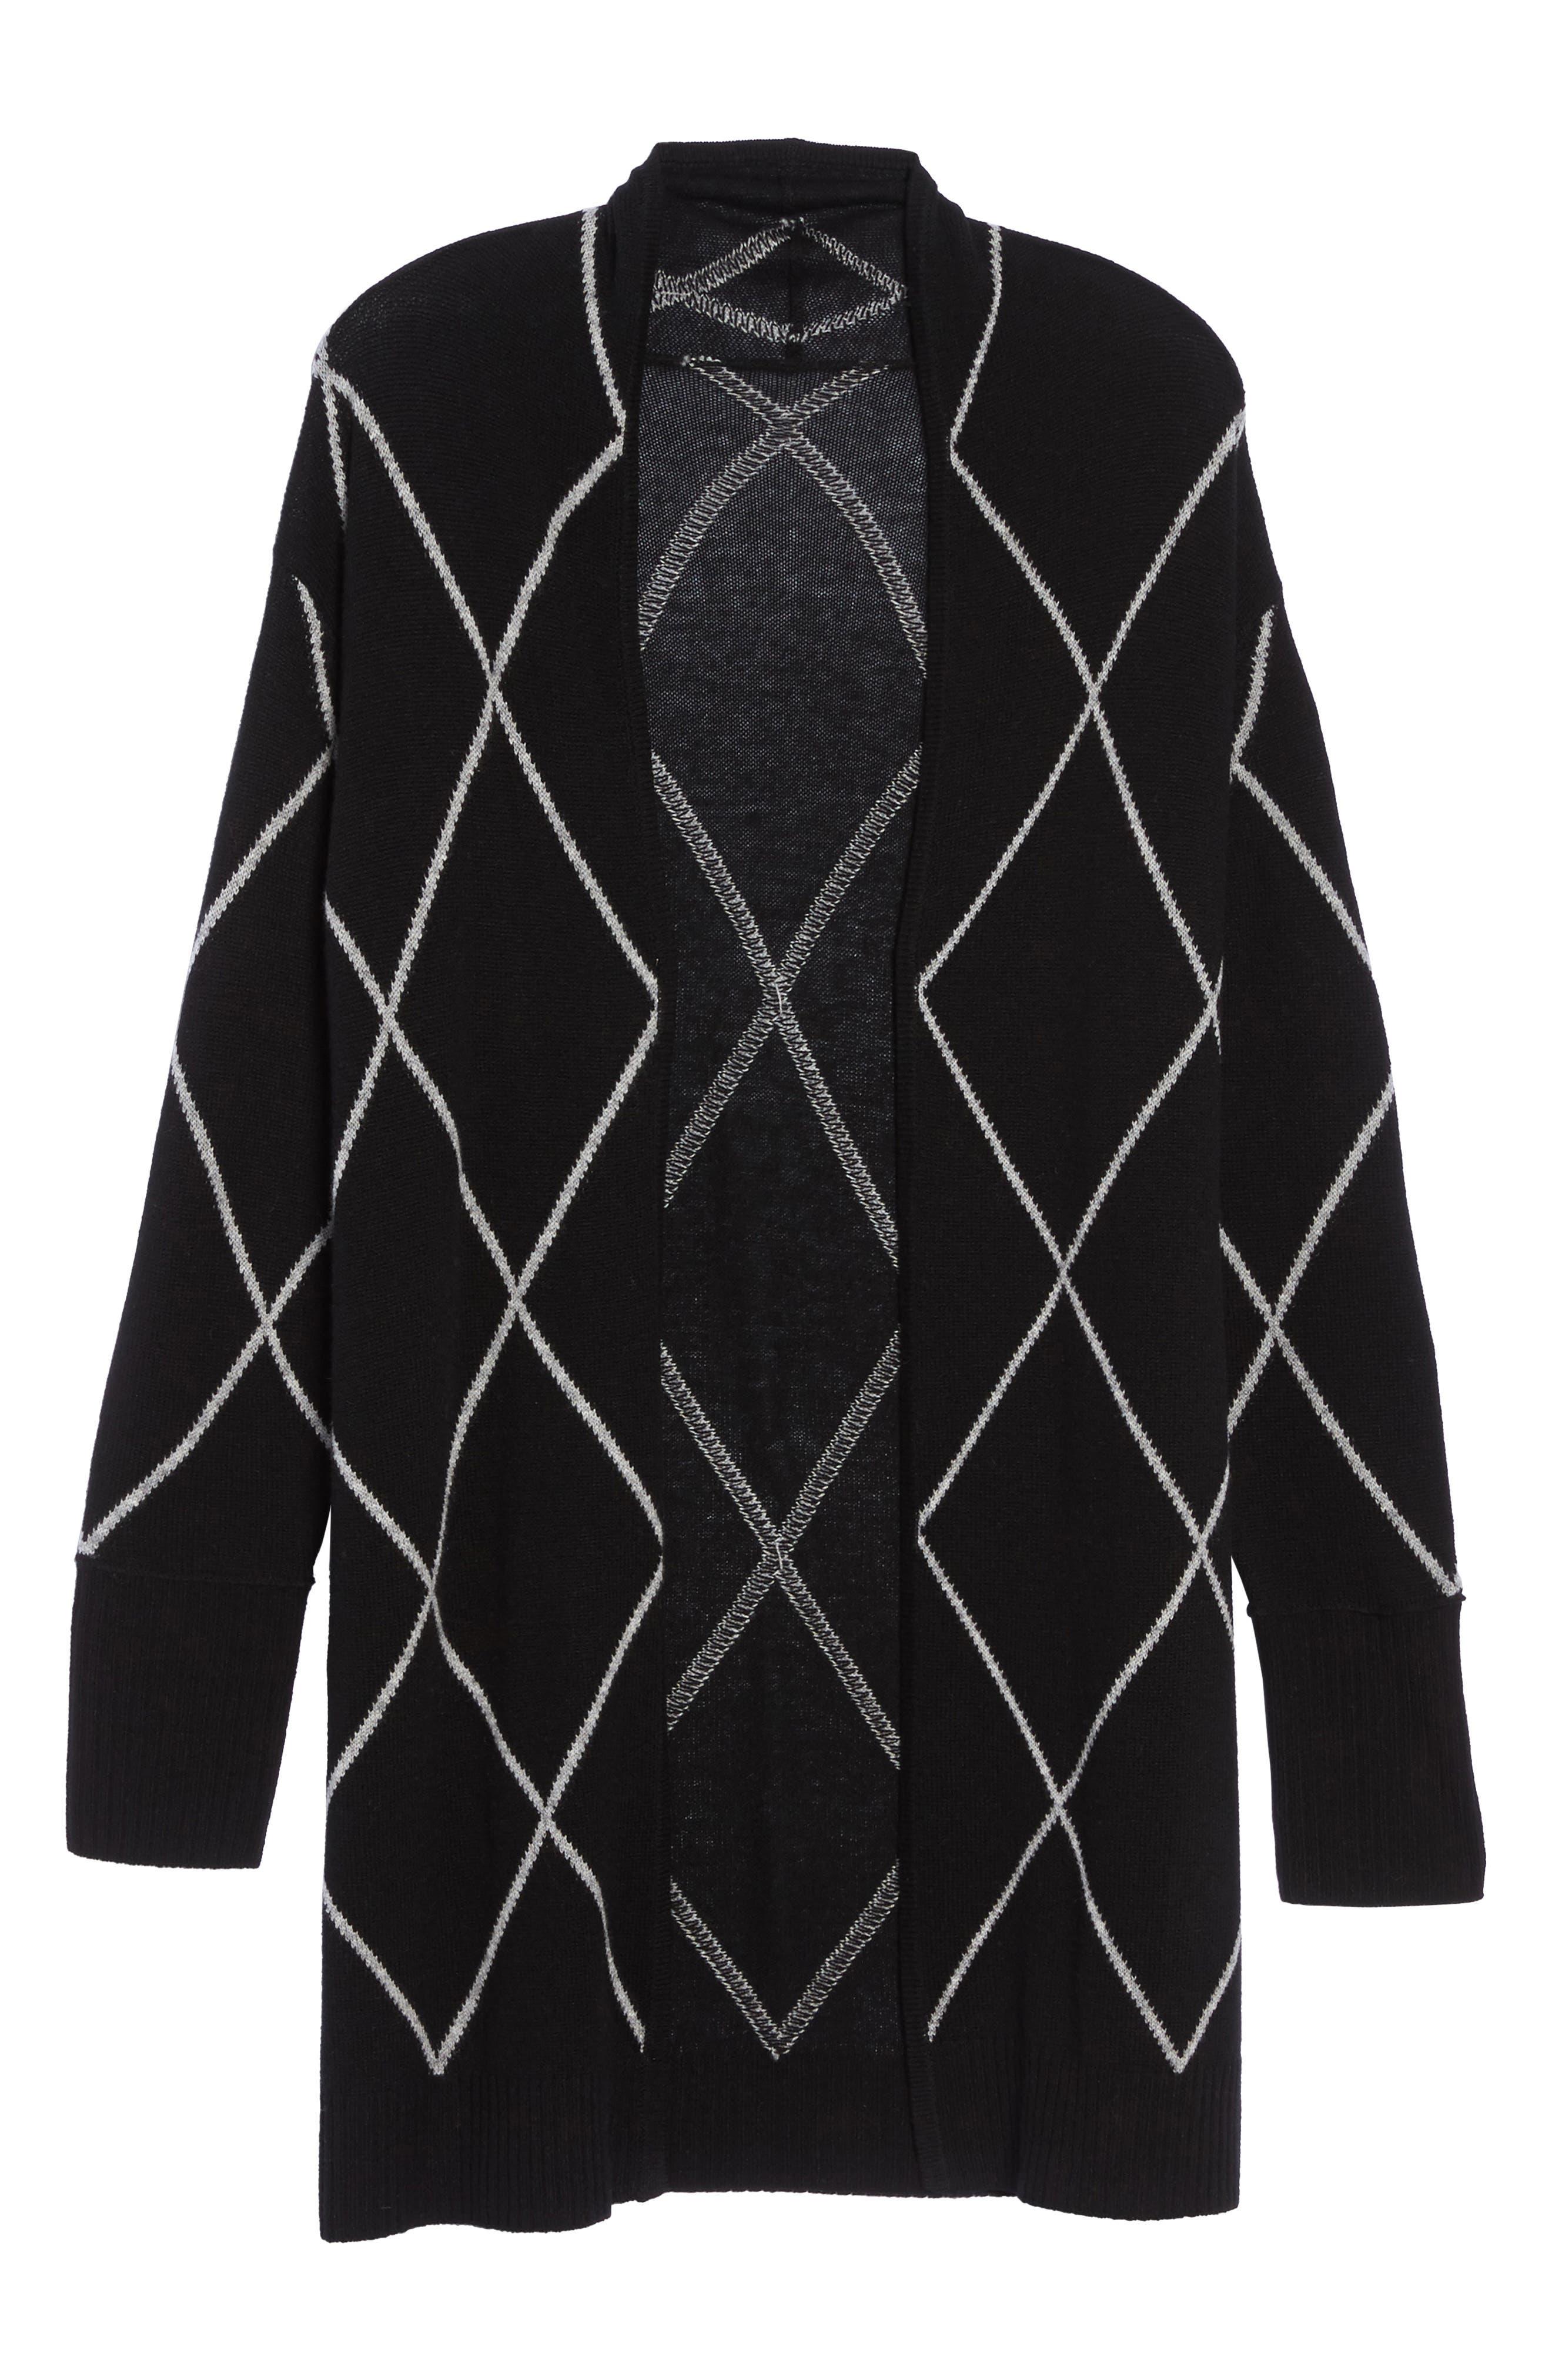 Windowpane Wool & Cashmere Cardigan,                             Alternate thumbnail 7, color,                             Black Windowpane